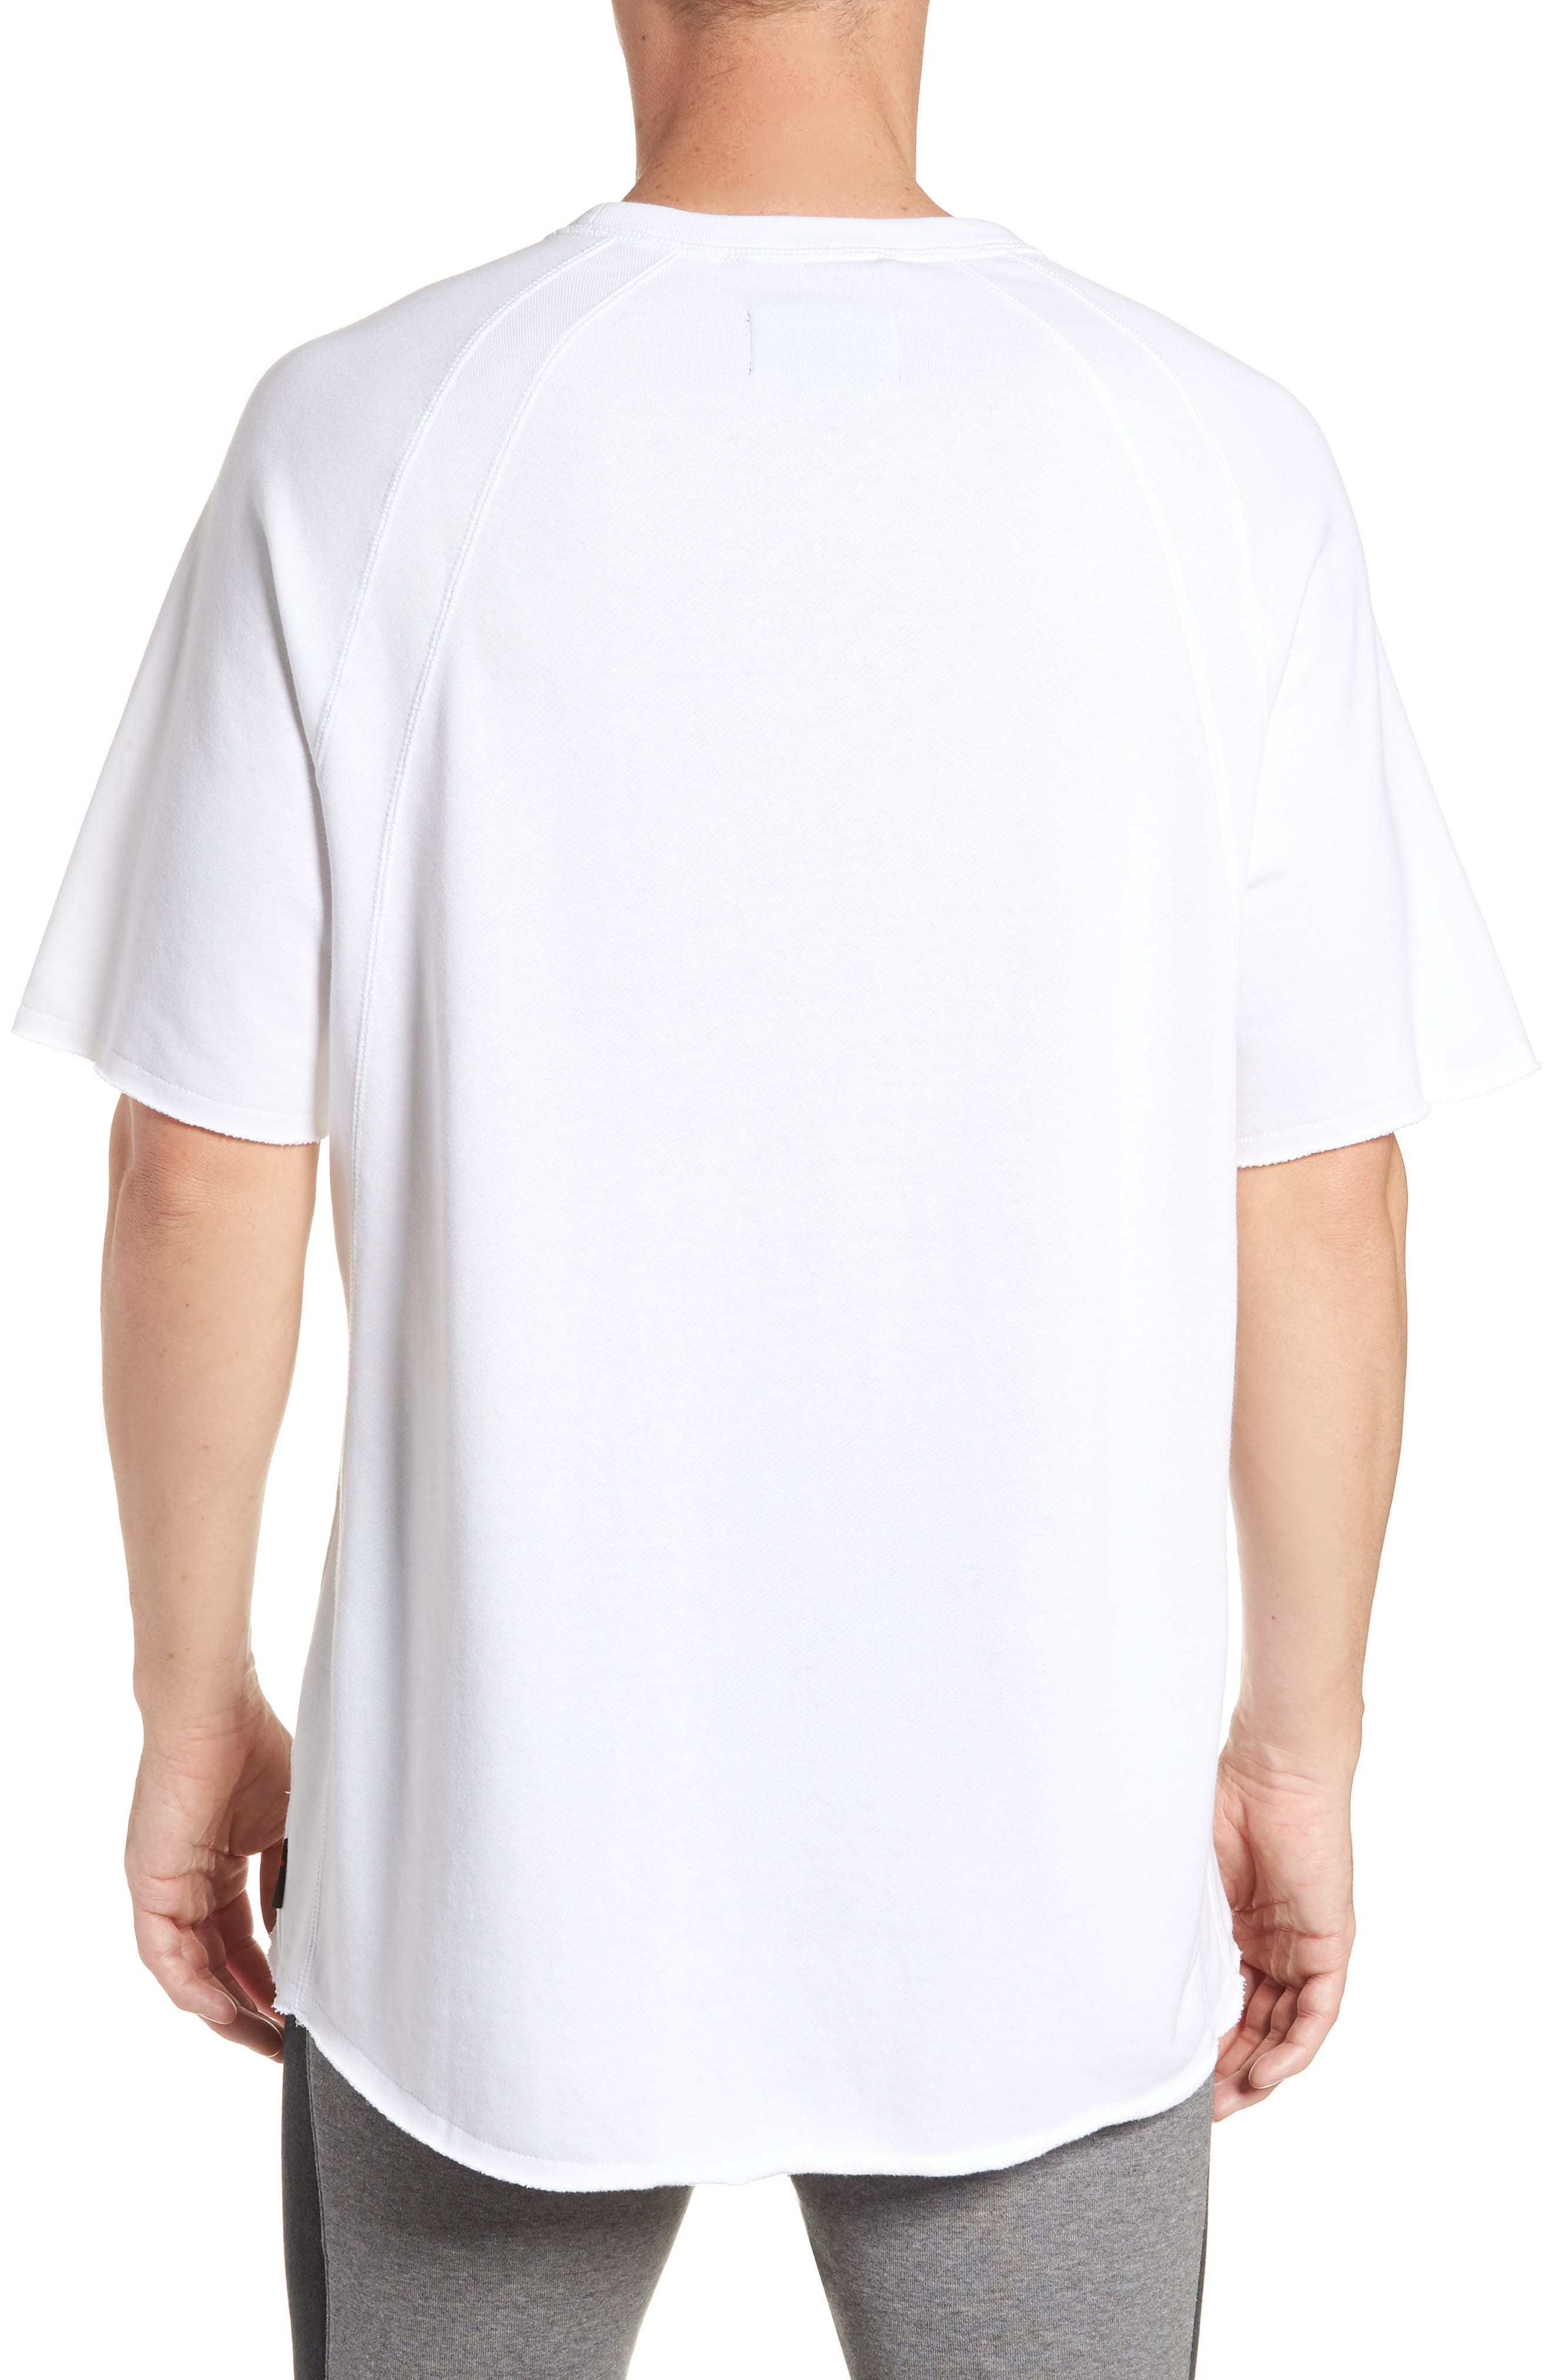 JORDAN,                             Wings Light Short Sleeve Sweatshirt,                             Alternate thumbnail 2, color,                             WHITE/ BLACK